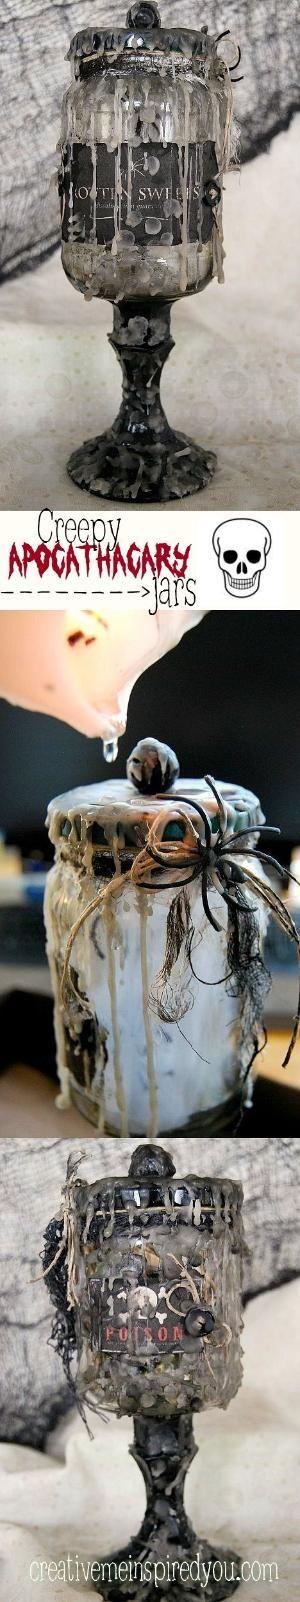 Love these creepy Halloween jars! by Kardemon Vintage yesterdays - creepy halloween decorations homemade